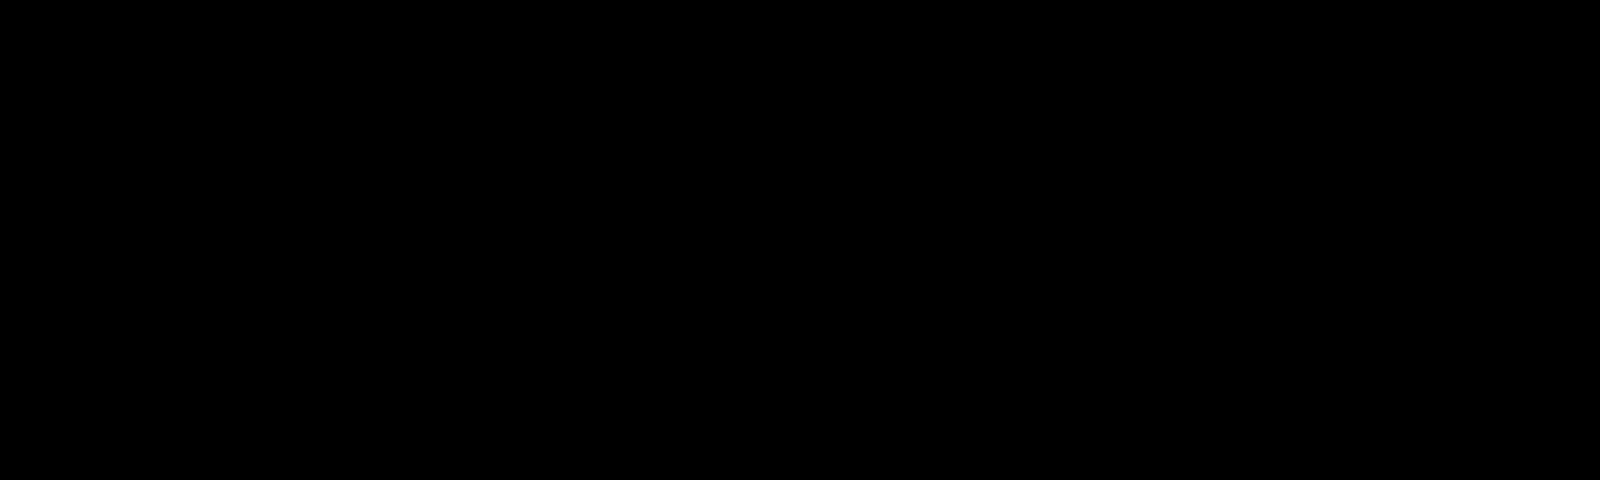 Equation of rotational motion Formula 4